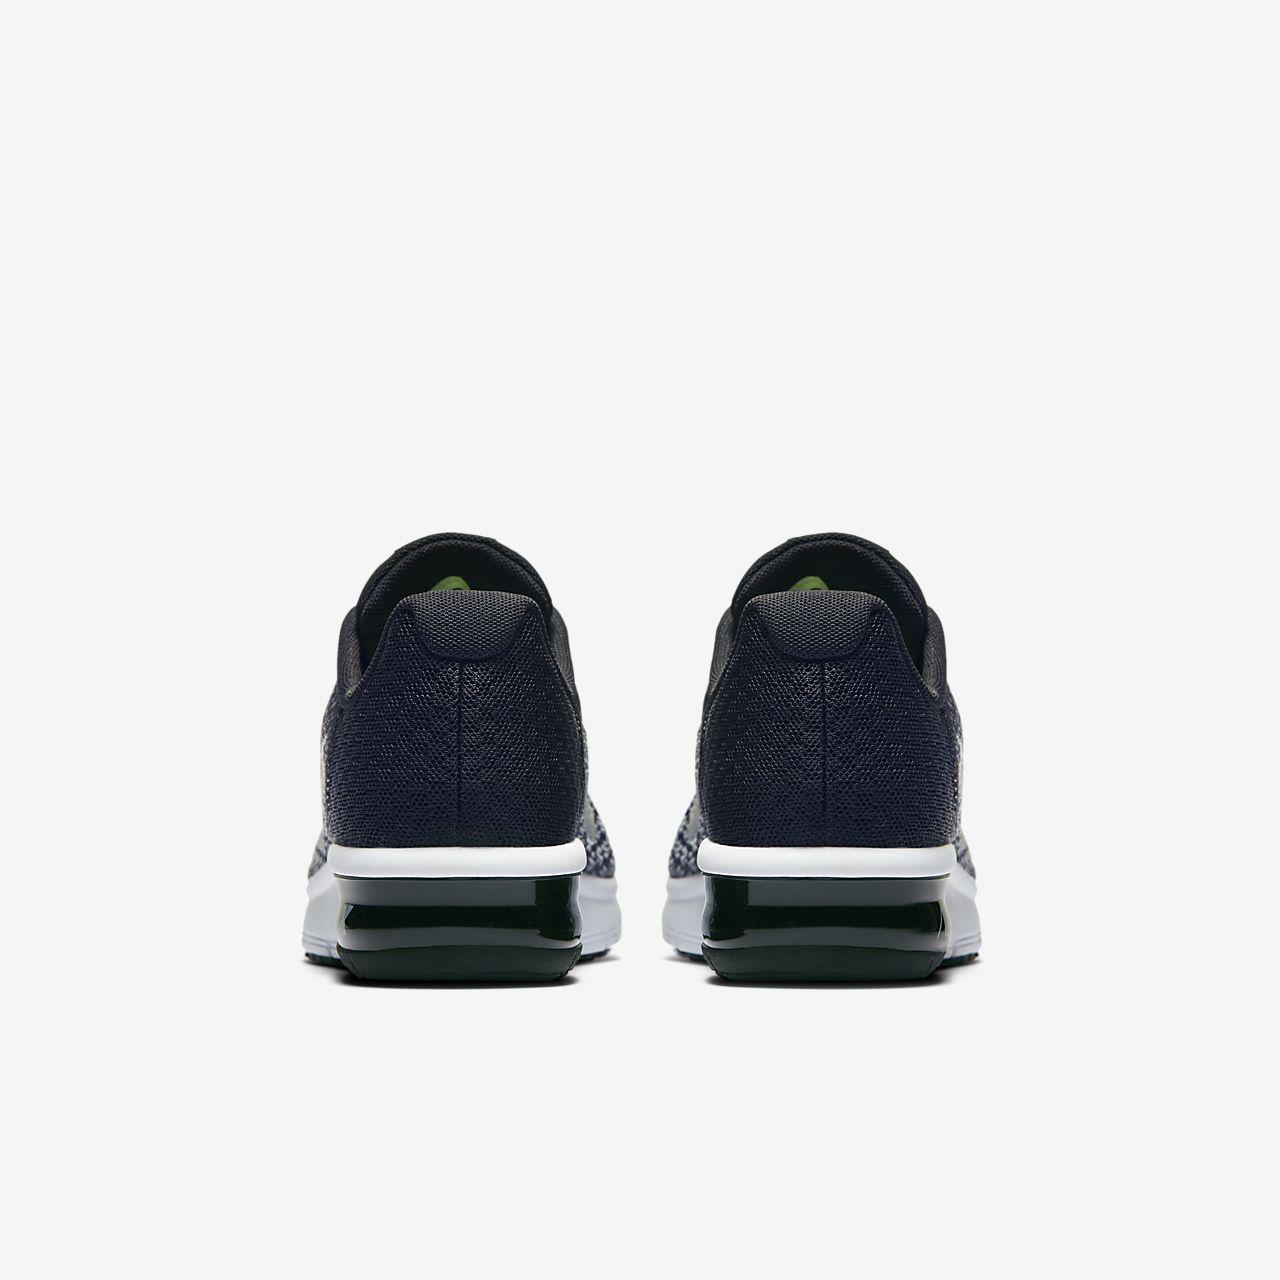 best service 811e7 718e8 ... Nike Air Max Sequent 2 Hardloopschoen kids